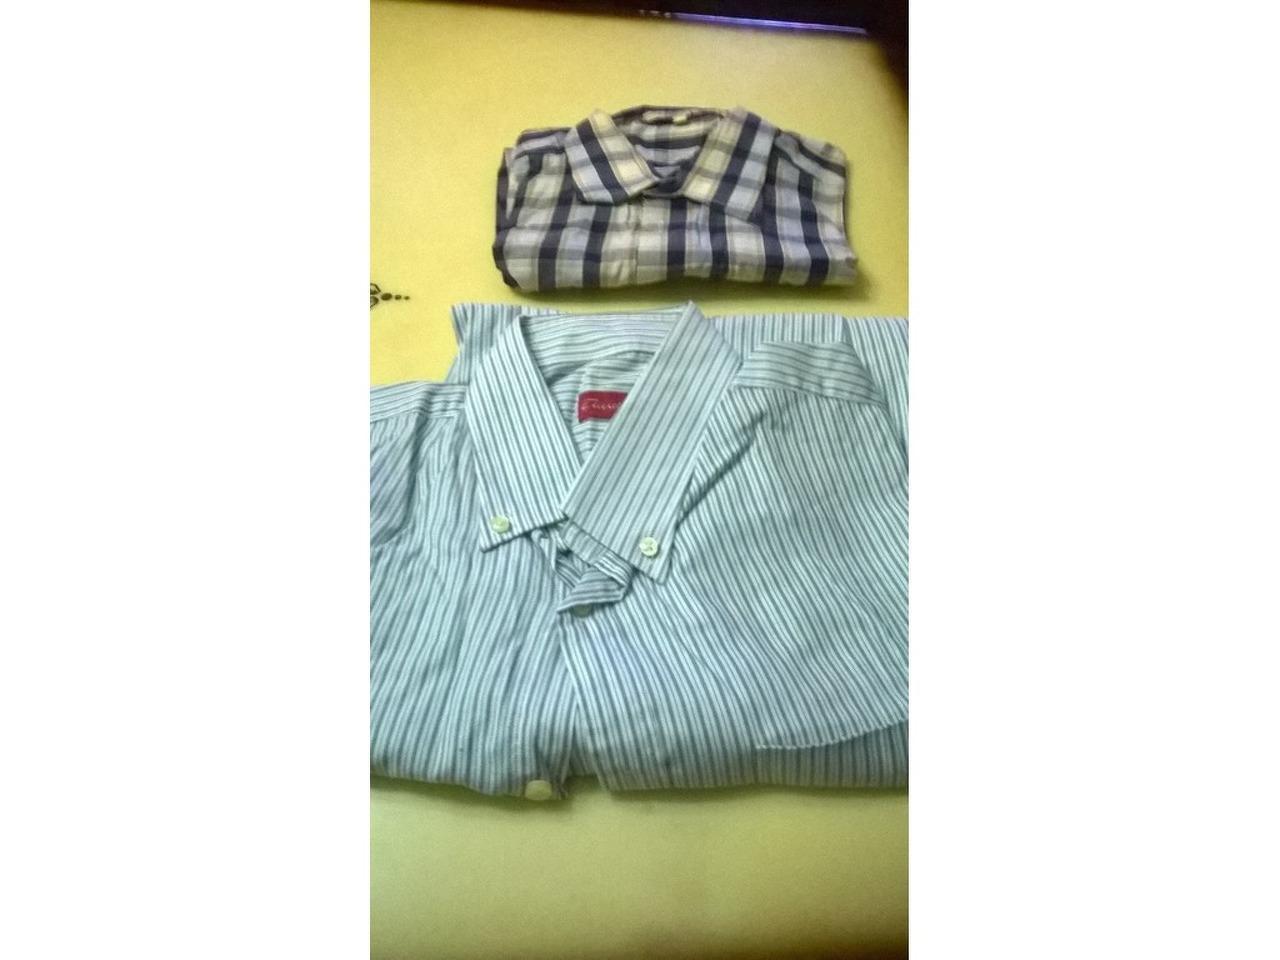 Camisas Diversas (2ª mão) WestPoint, Emidio Tucci, Posse, etc - 2/4